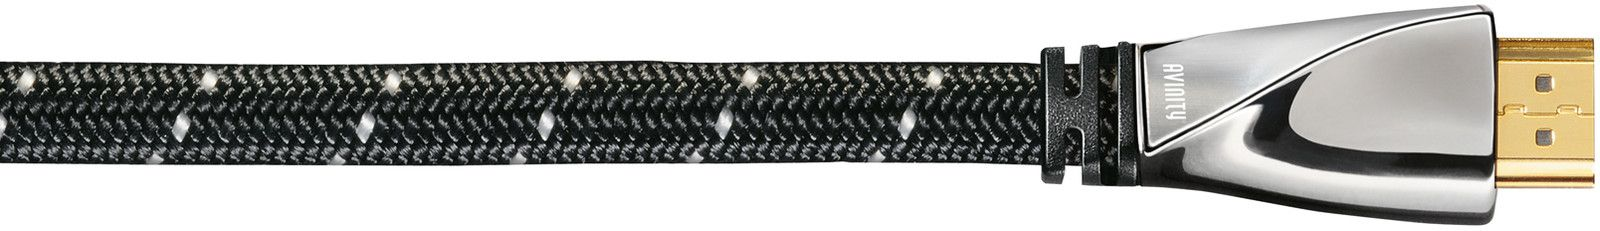 Avinity HDMI-kabel (klass 5) – 3m